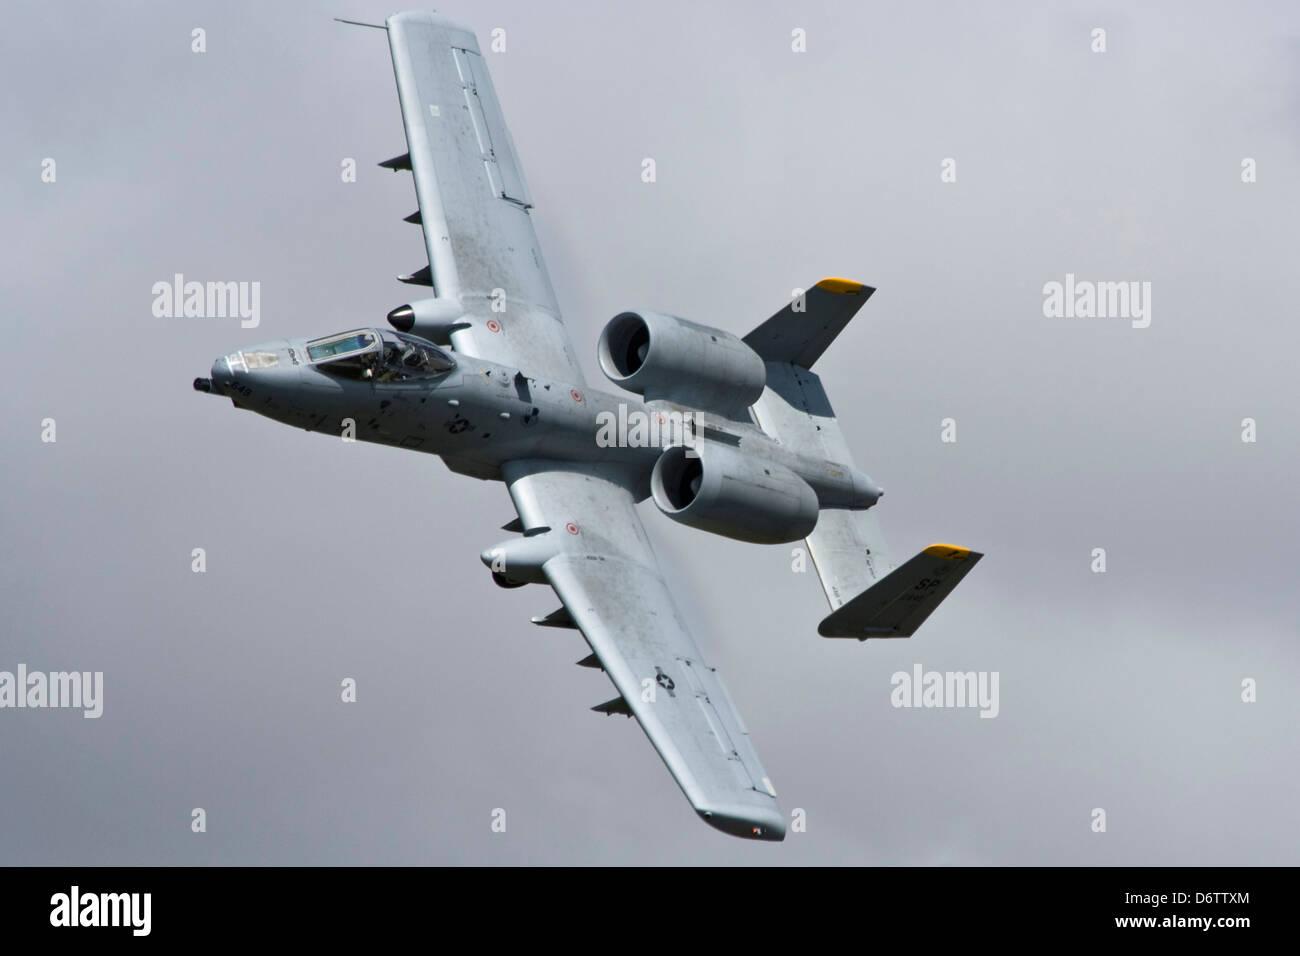 82649 A10 Thunderbolt Warthog Tankbuster Flying at IAT Fairford - Stock Image